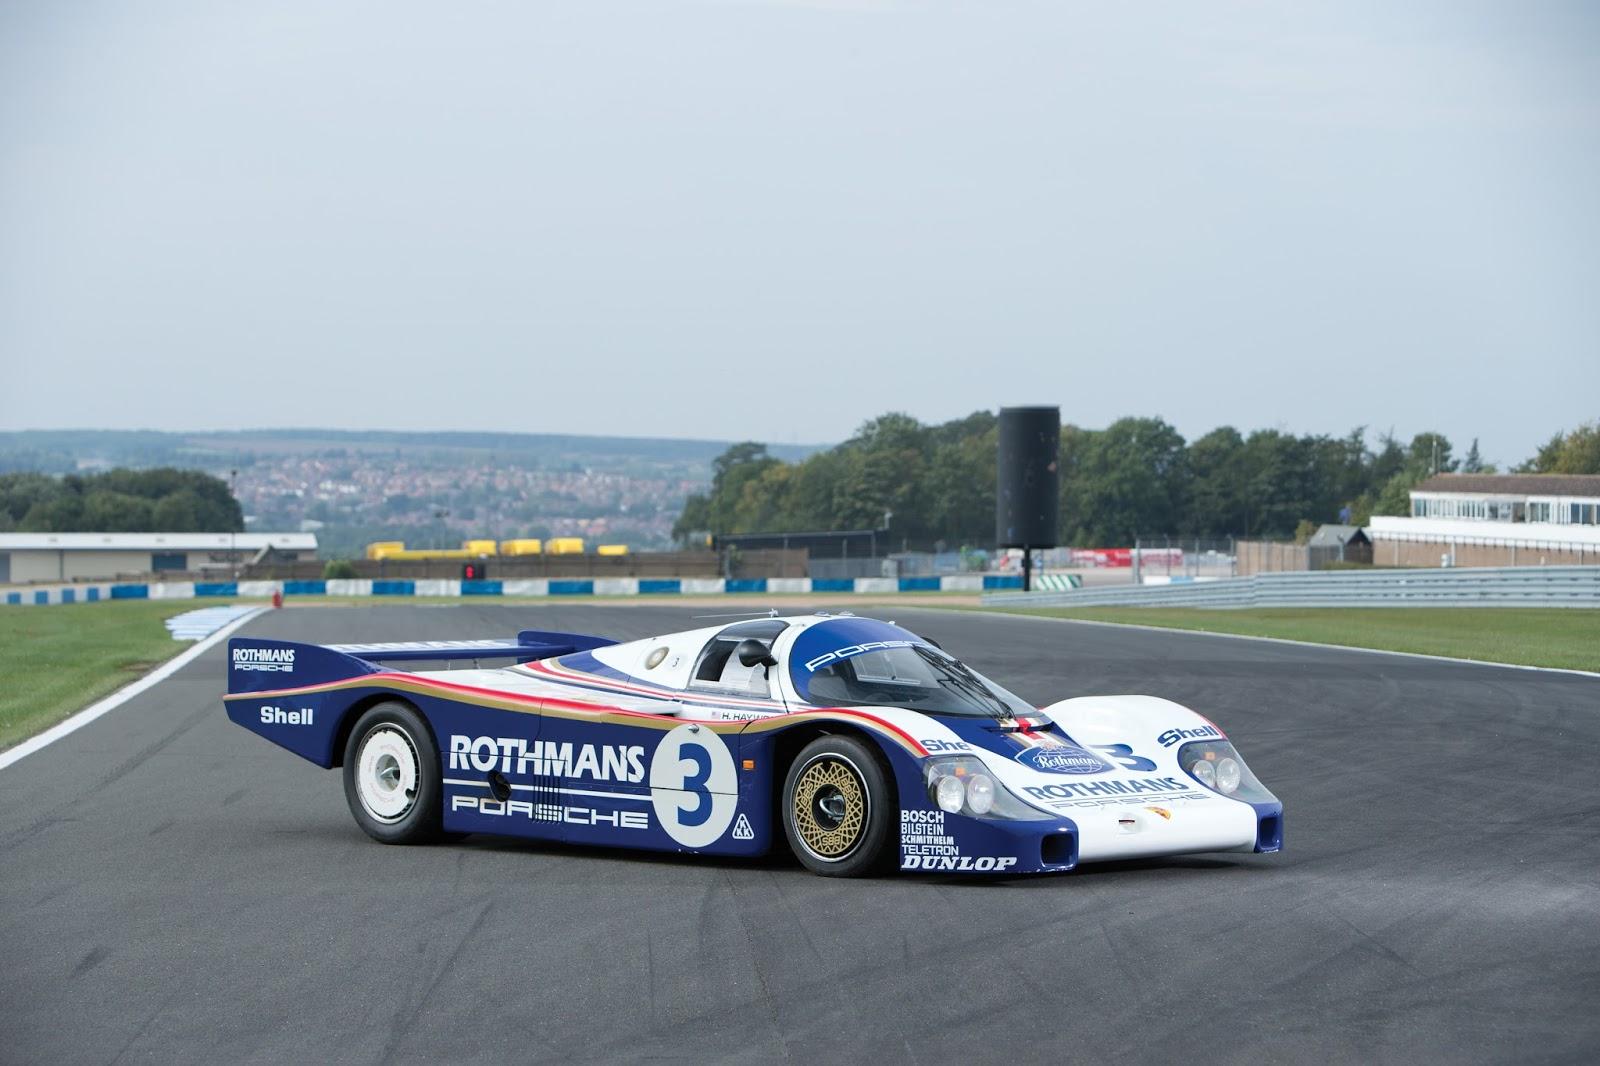 porsche2B9562Bwinner Με 8 εκατομμυριάκια αγοράζεις την Porsche που κέρδισε το Le Mans Porsche 956, Porsche Le Mans, zblog, δημοπρασία, ευρώ